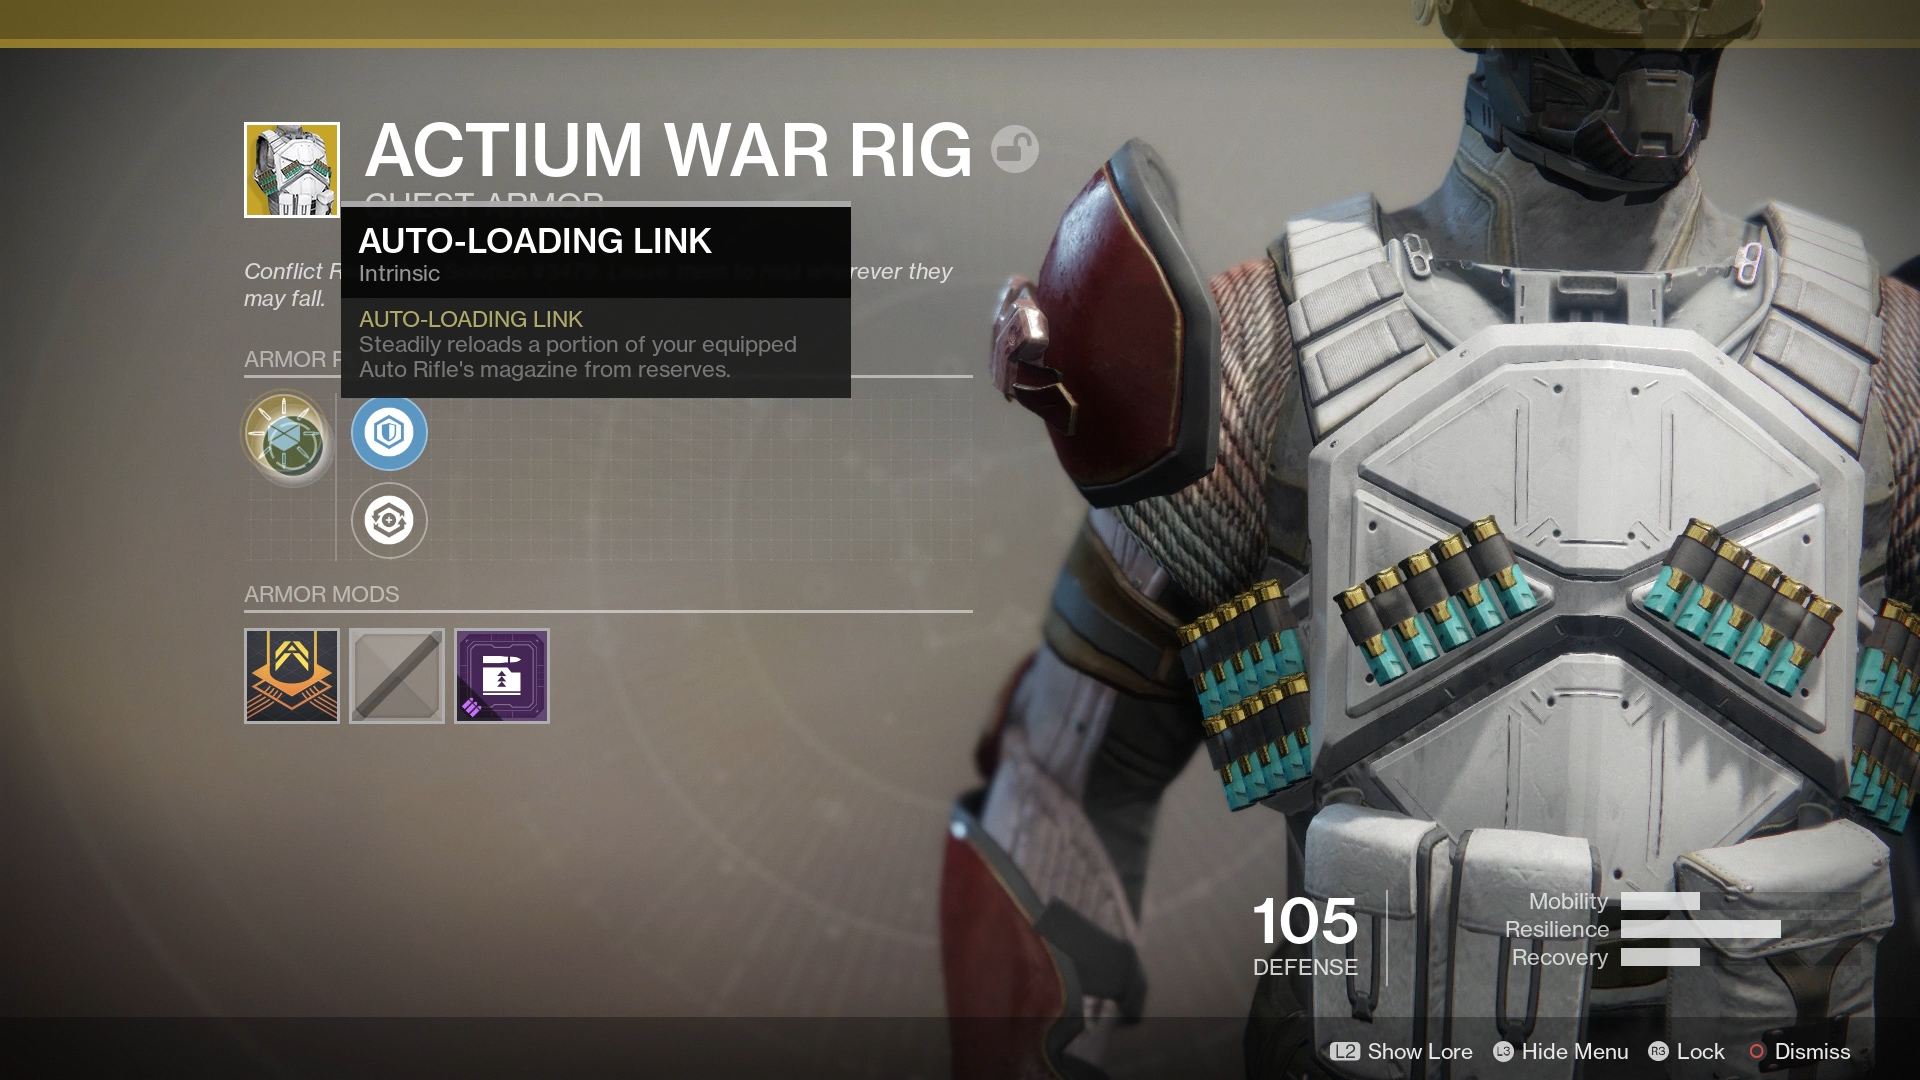 Actium War Rig Exotic Perk Auto Loading Link